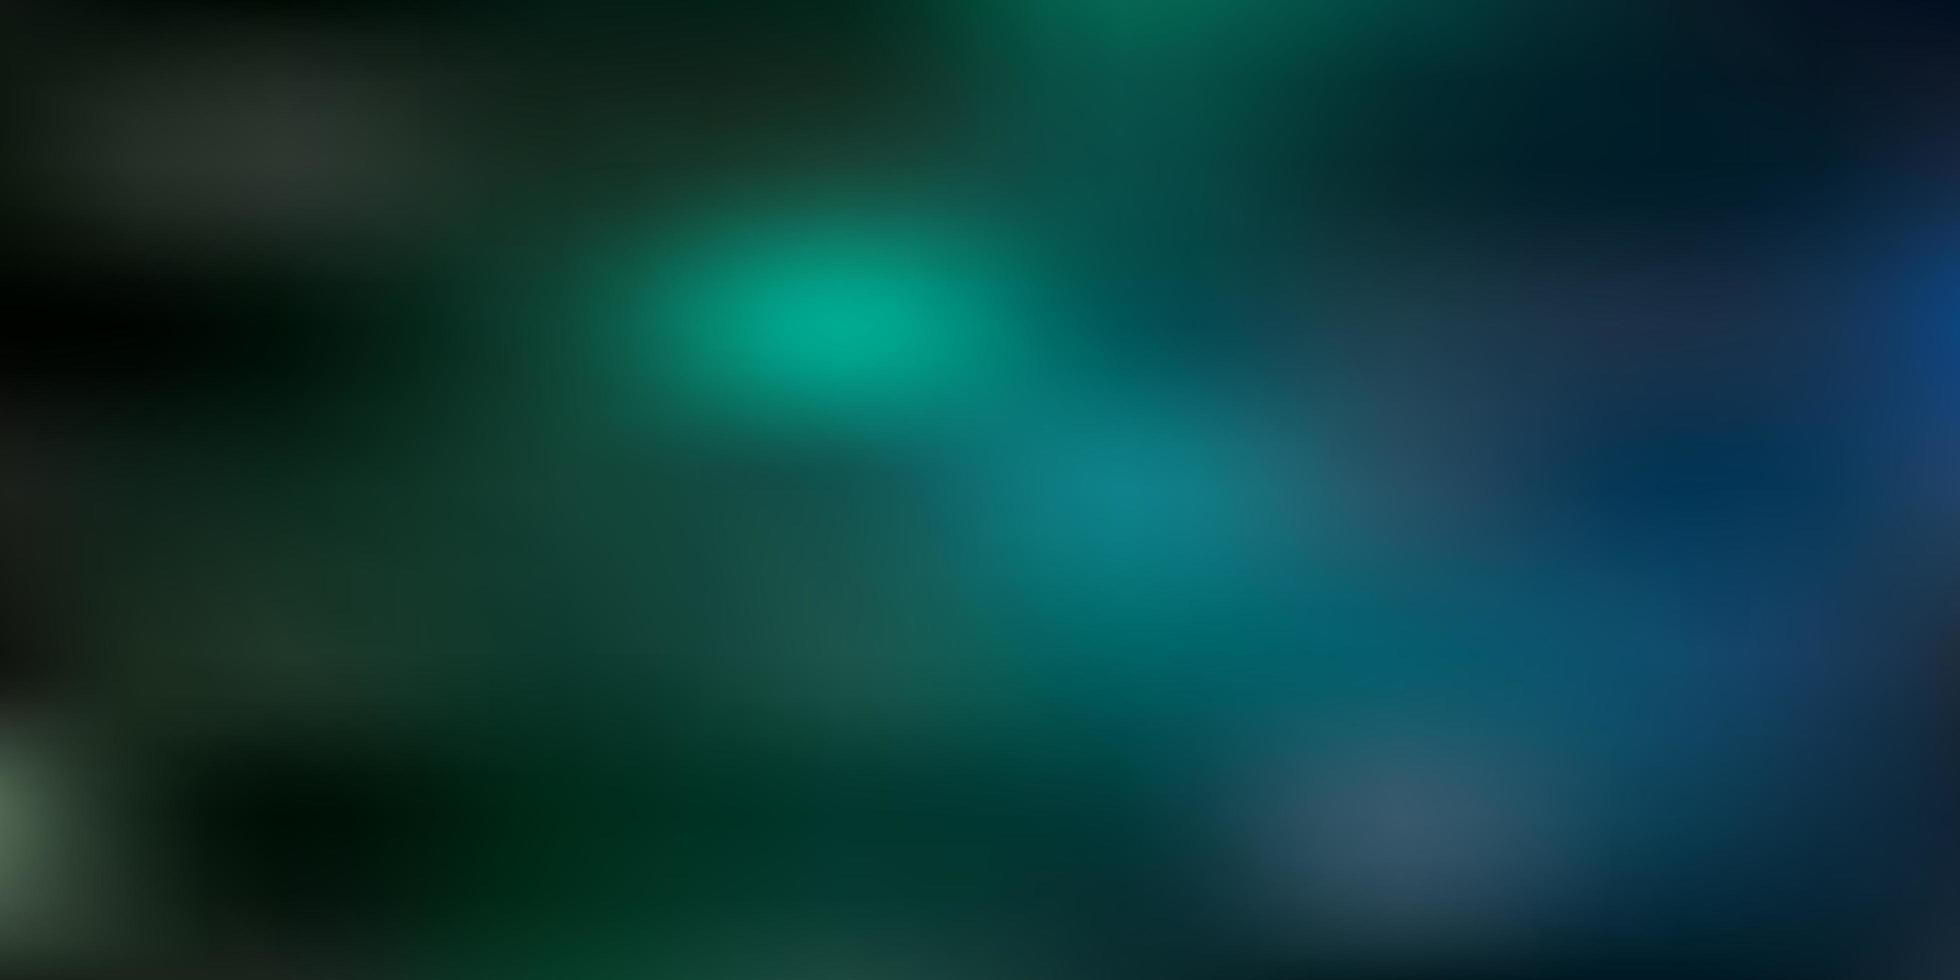 trama di sfocatura astratta vettoriale verde scuro.